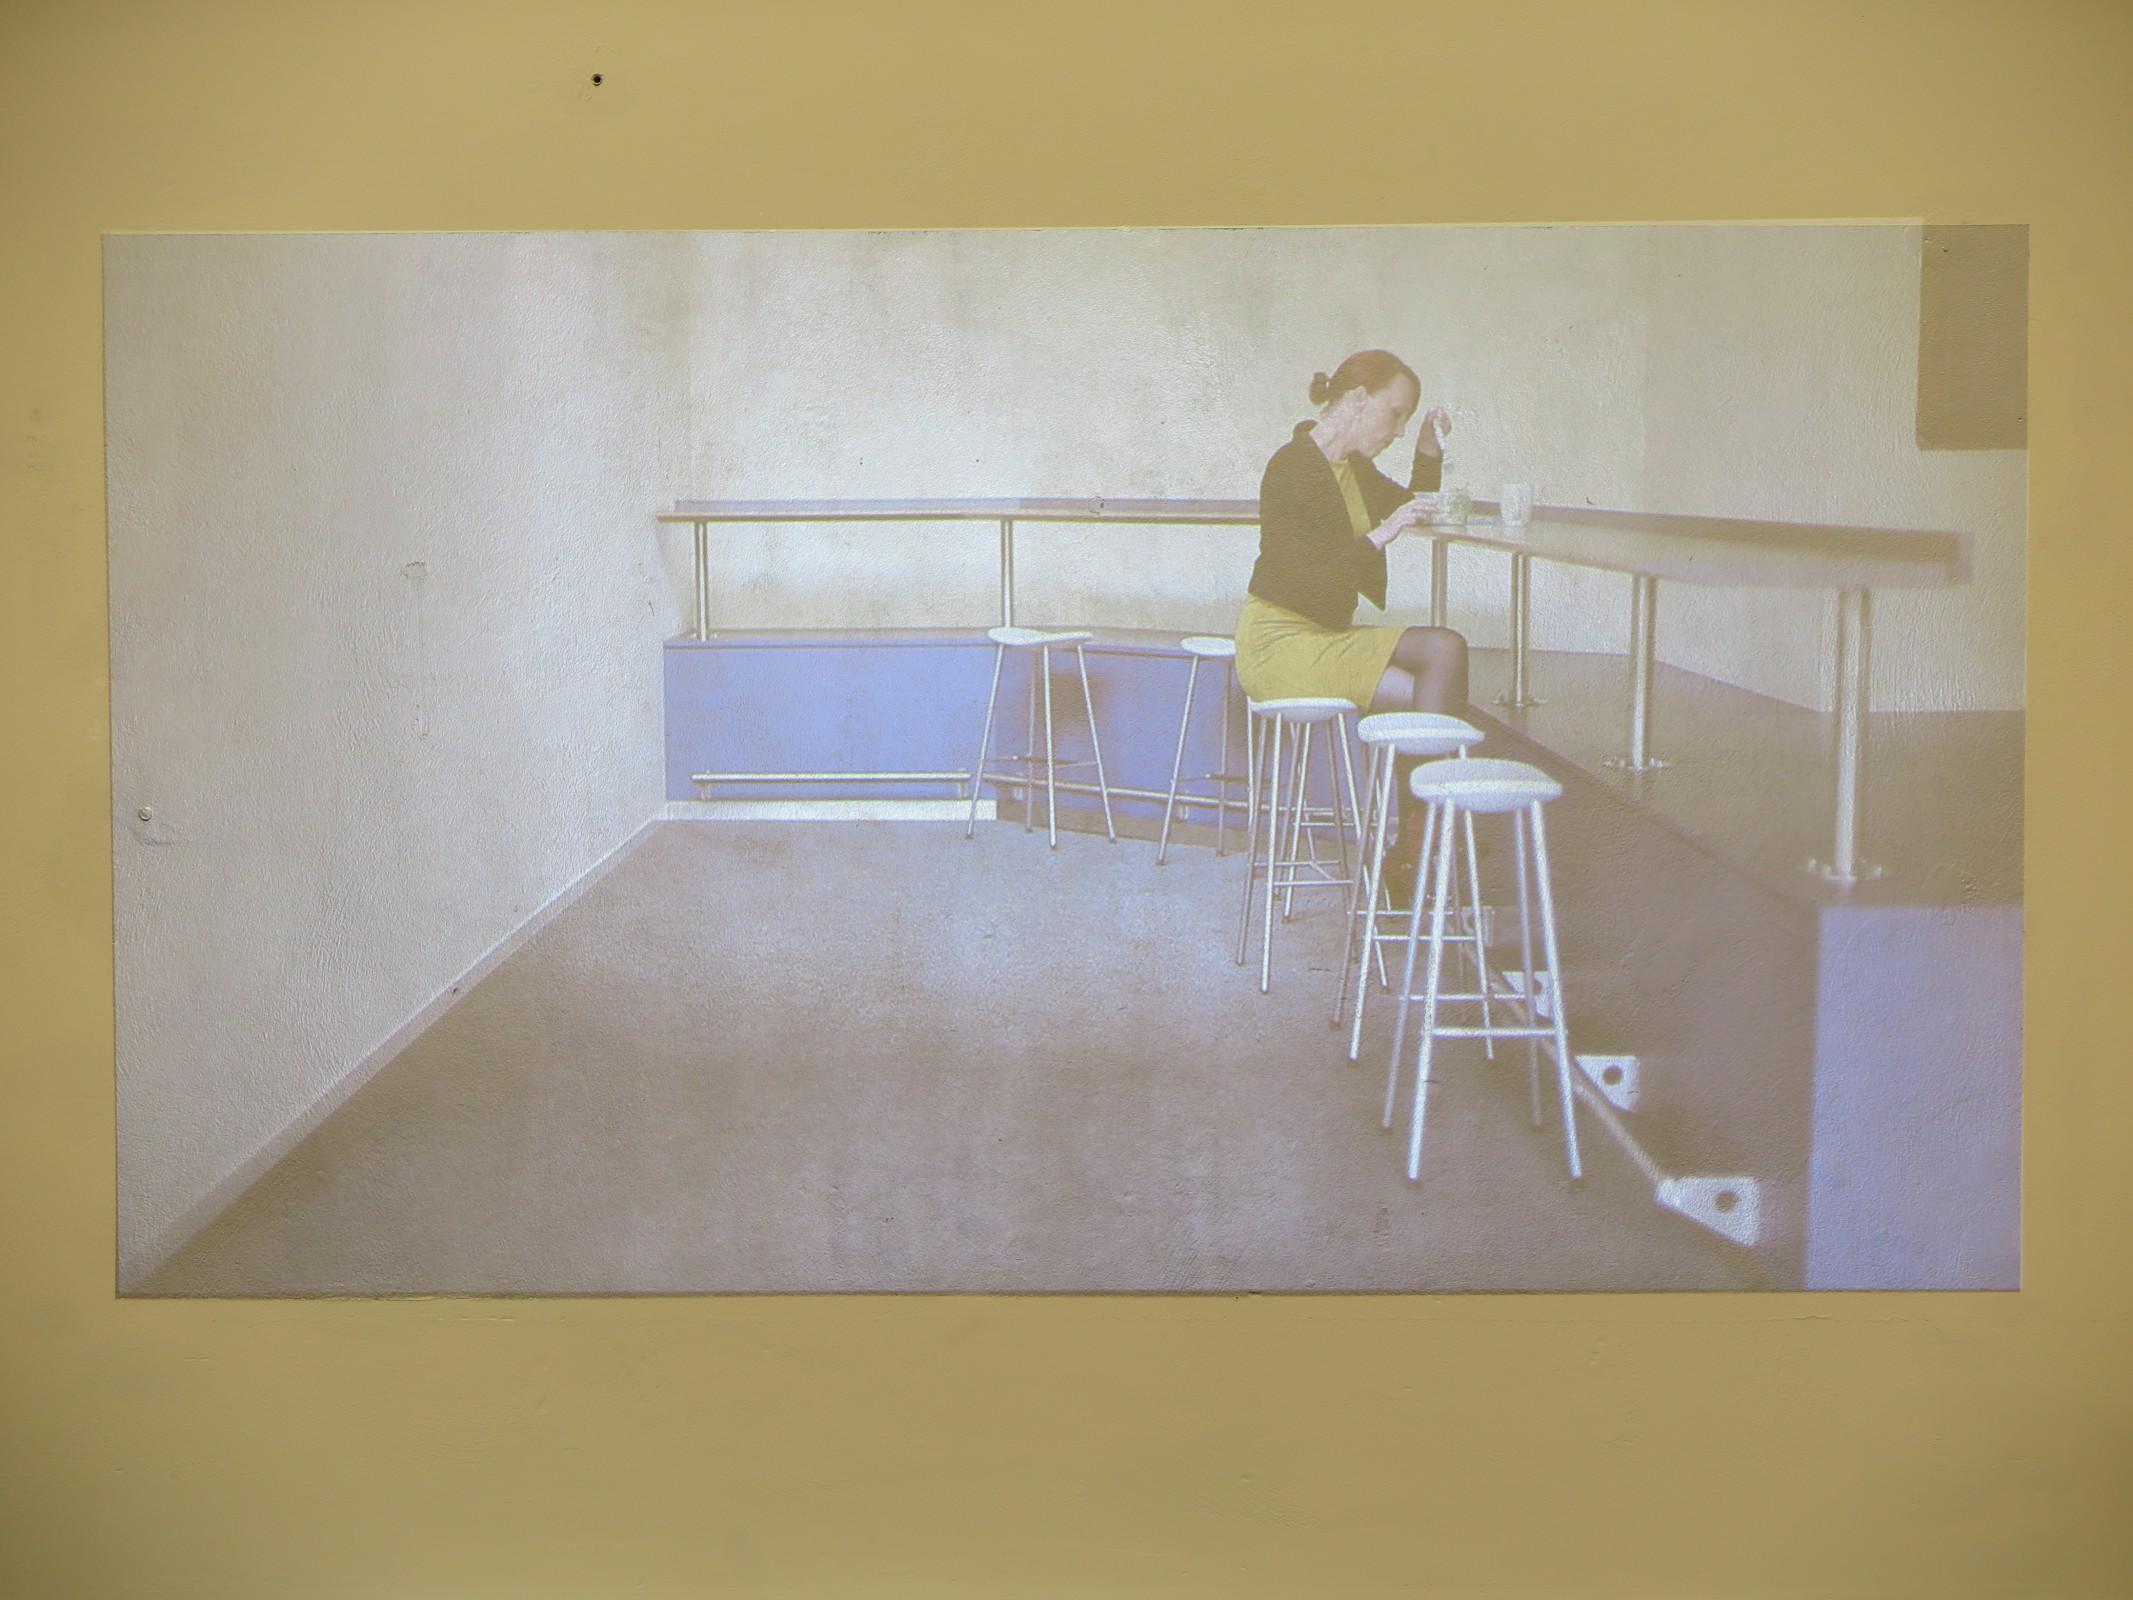 Sonia Laan - Corporate - 2015